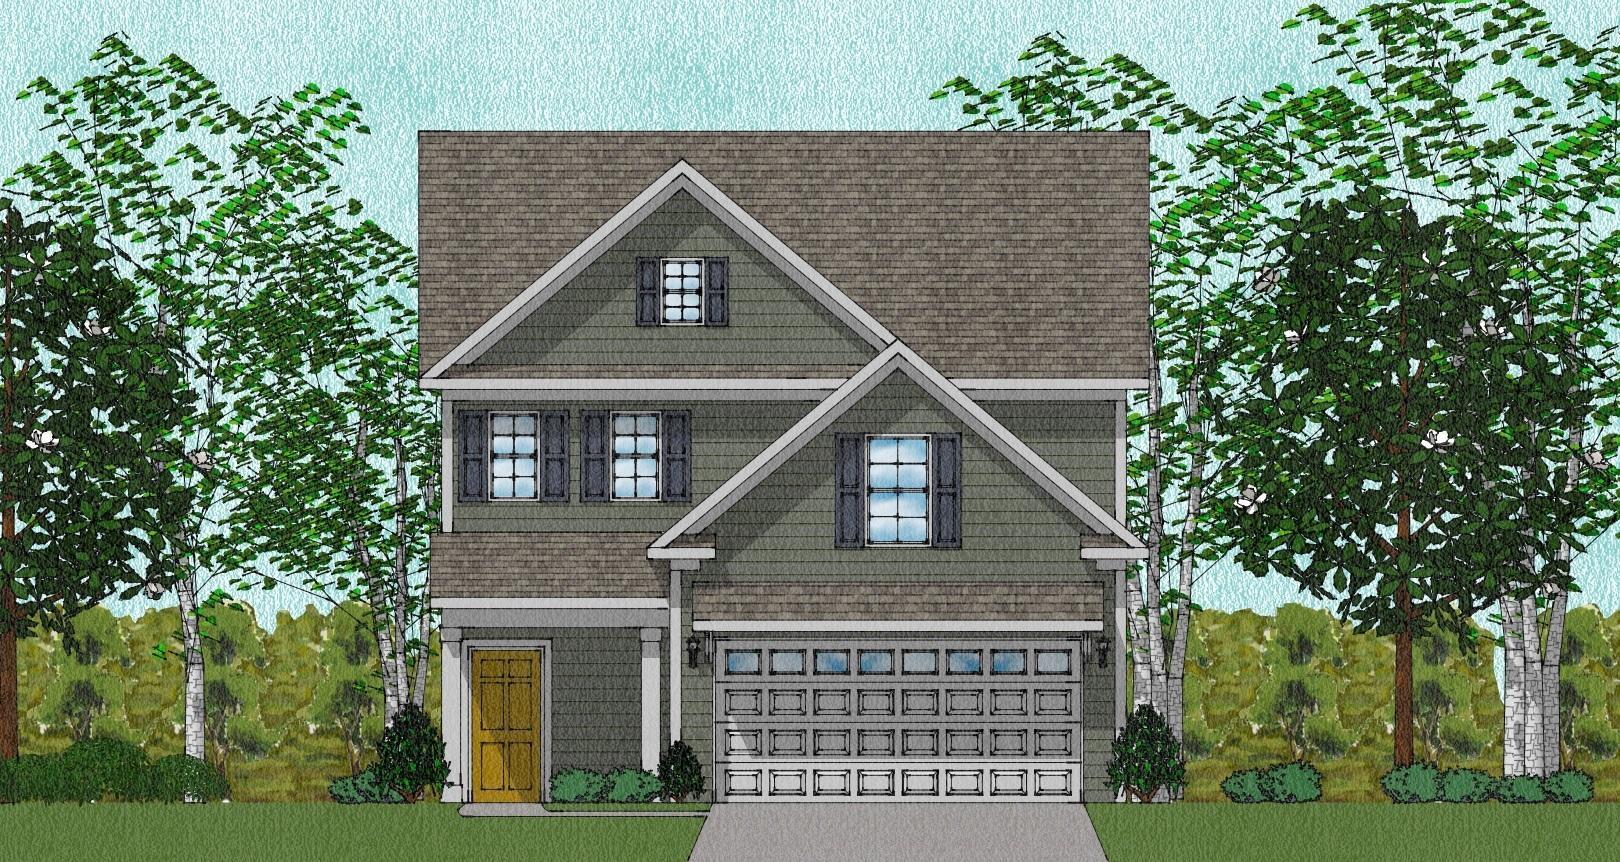 Church Creek Landing Homes For Sale - 2337 Town Woods, Charleston, SC - 0